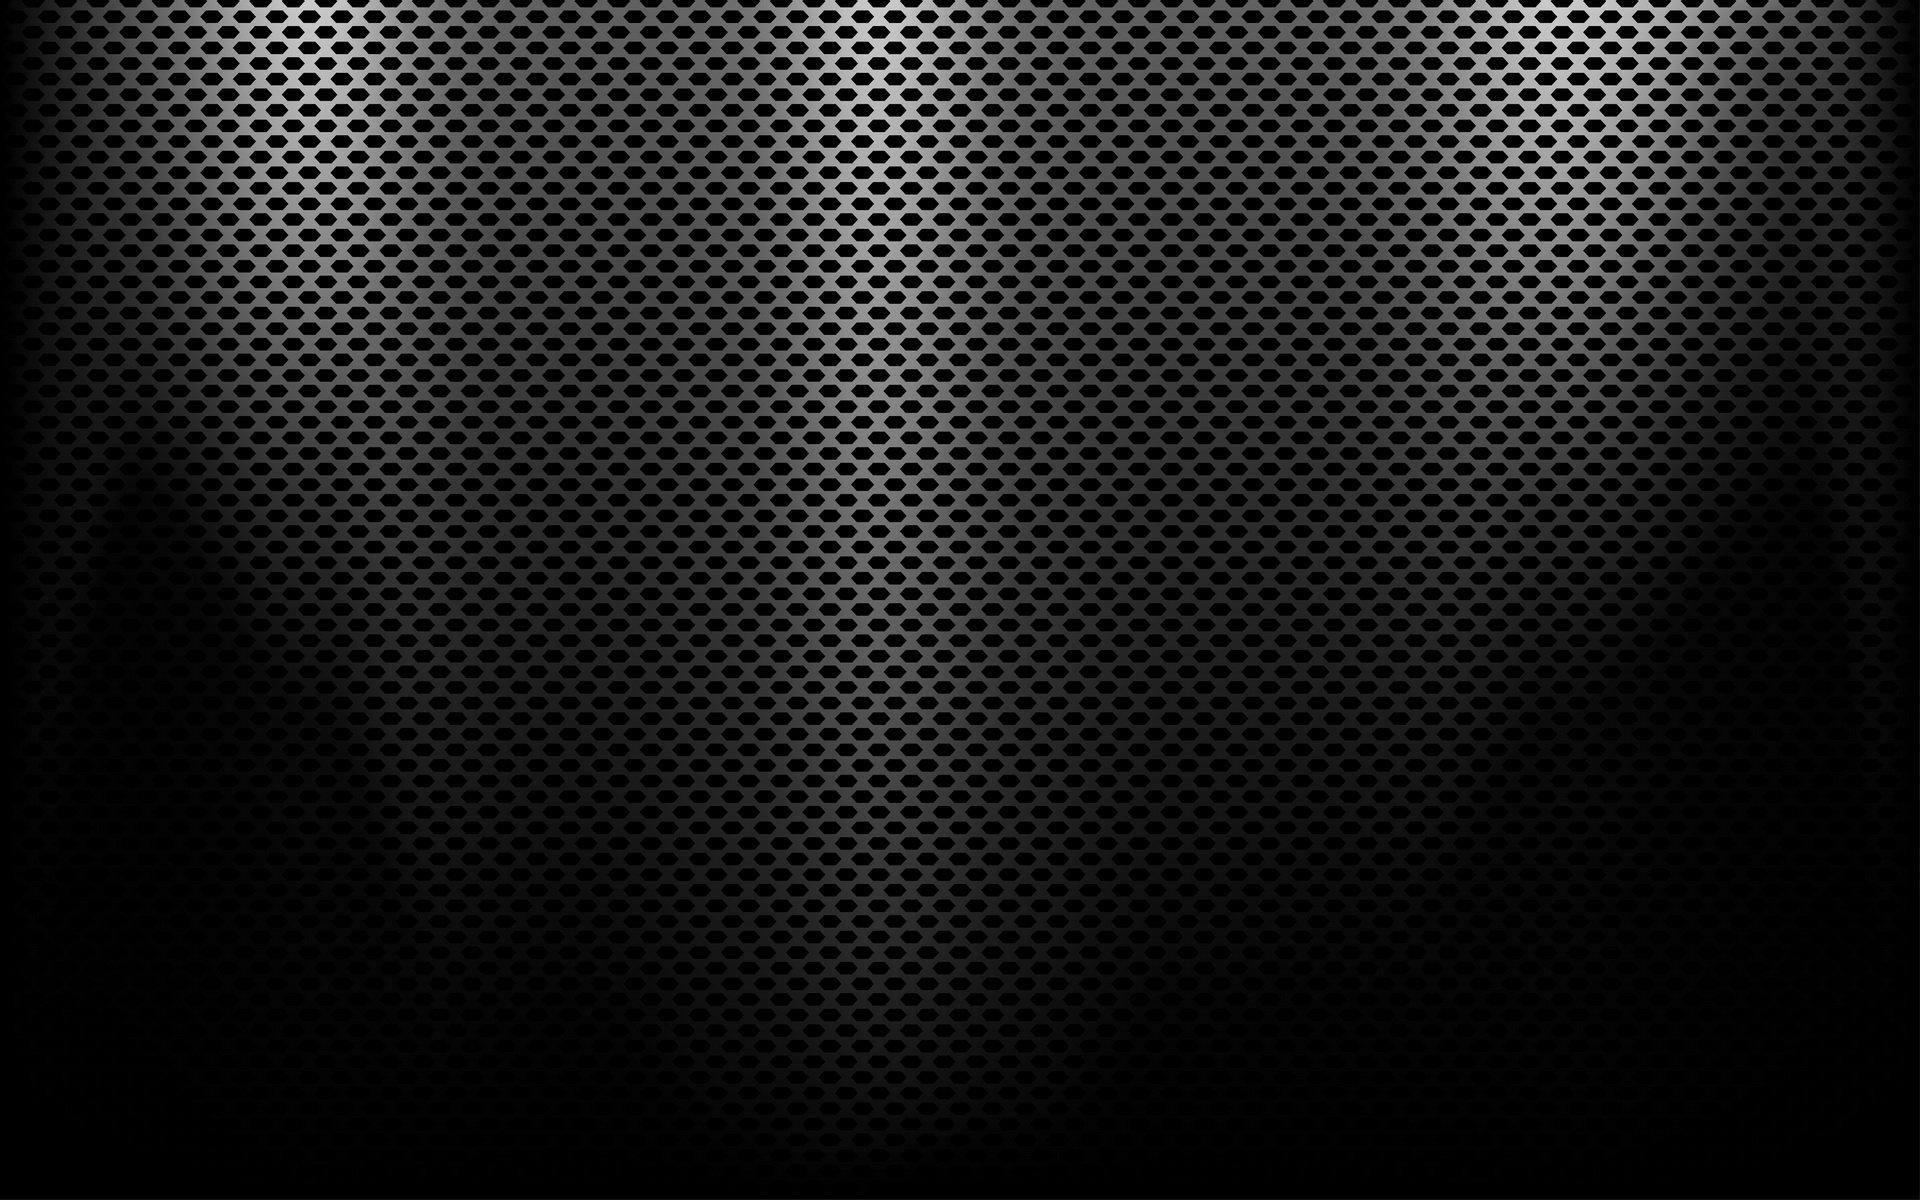 Iphone X Liquid Wallpaper Video Metal Full Hd Wallpaper And Background Image 1920x1200